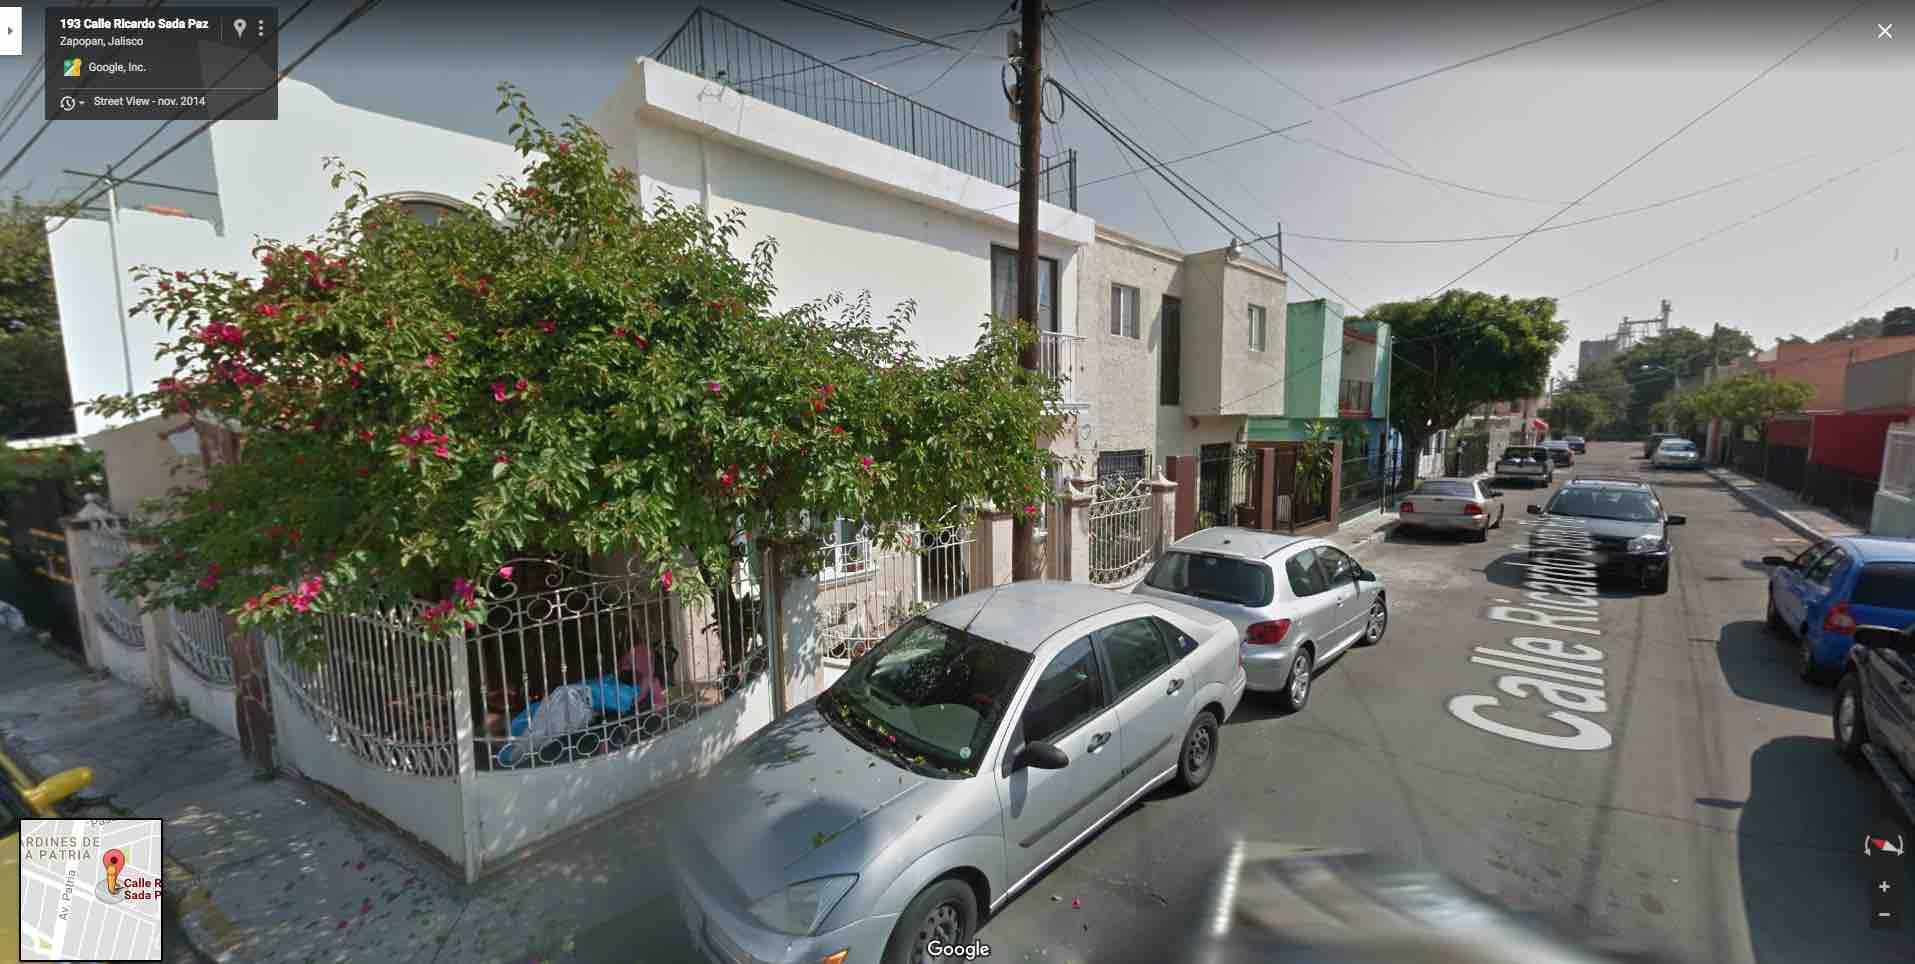 Fracc. Jardines de La Patria, Calle Ricardo Sada Paz 192, Zapopan, Jal. C.P. 45110